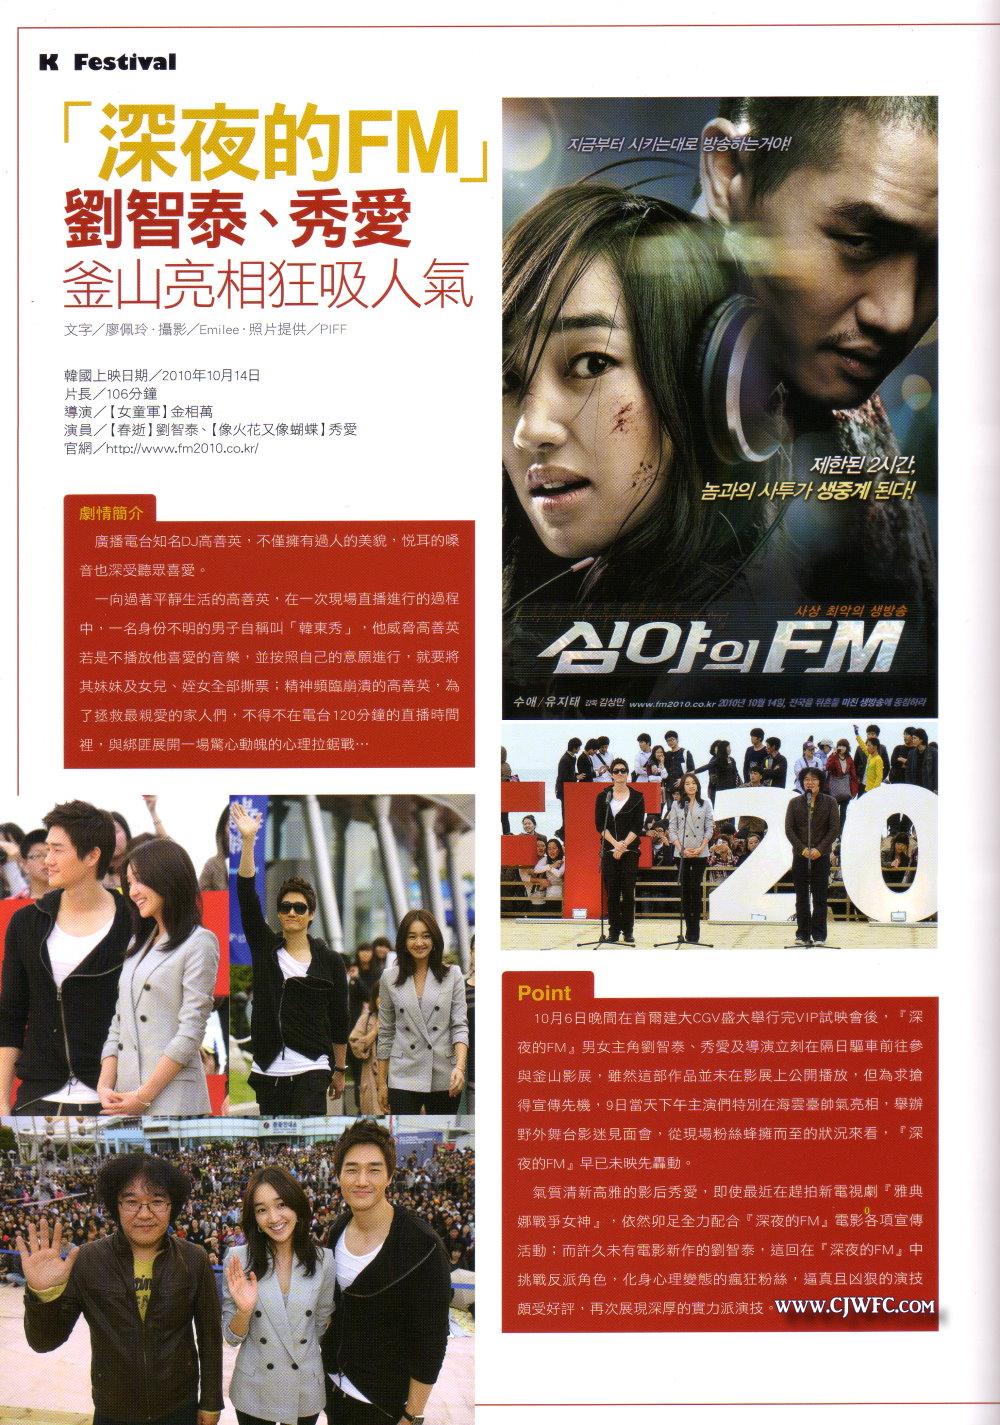 K-Star-04-01.jpg